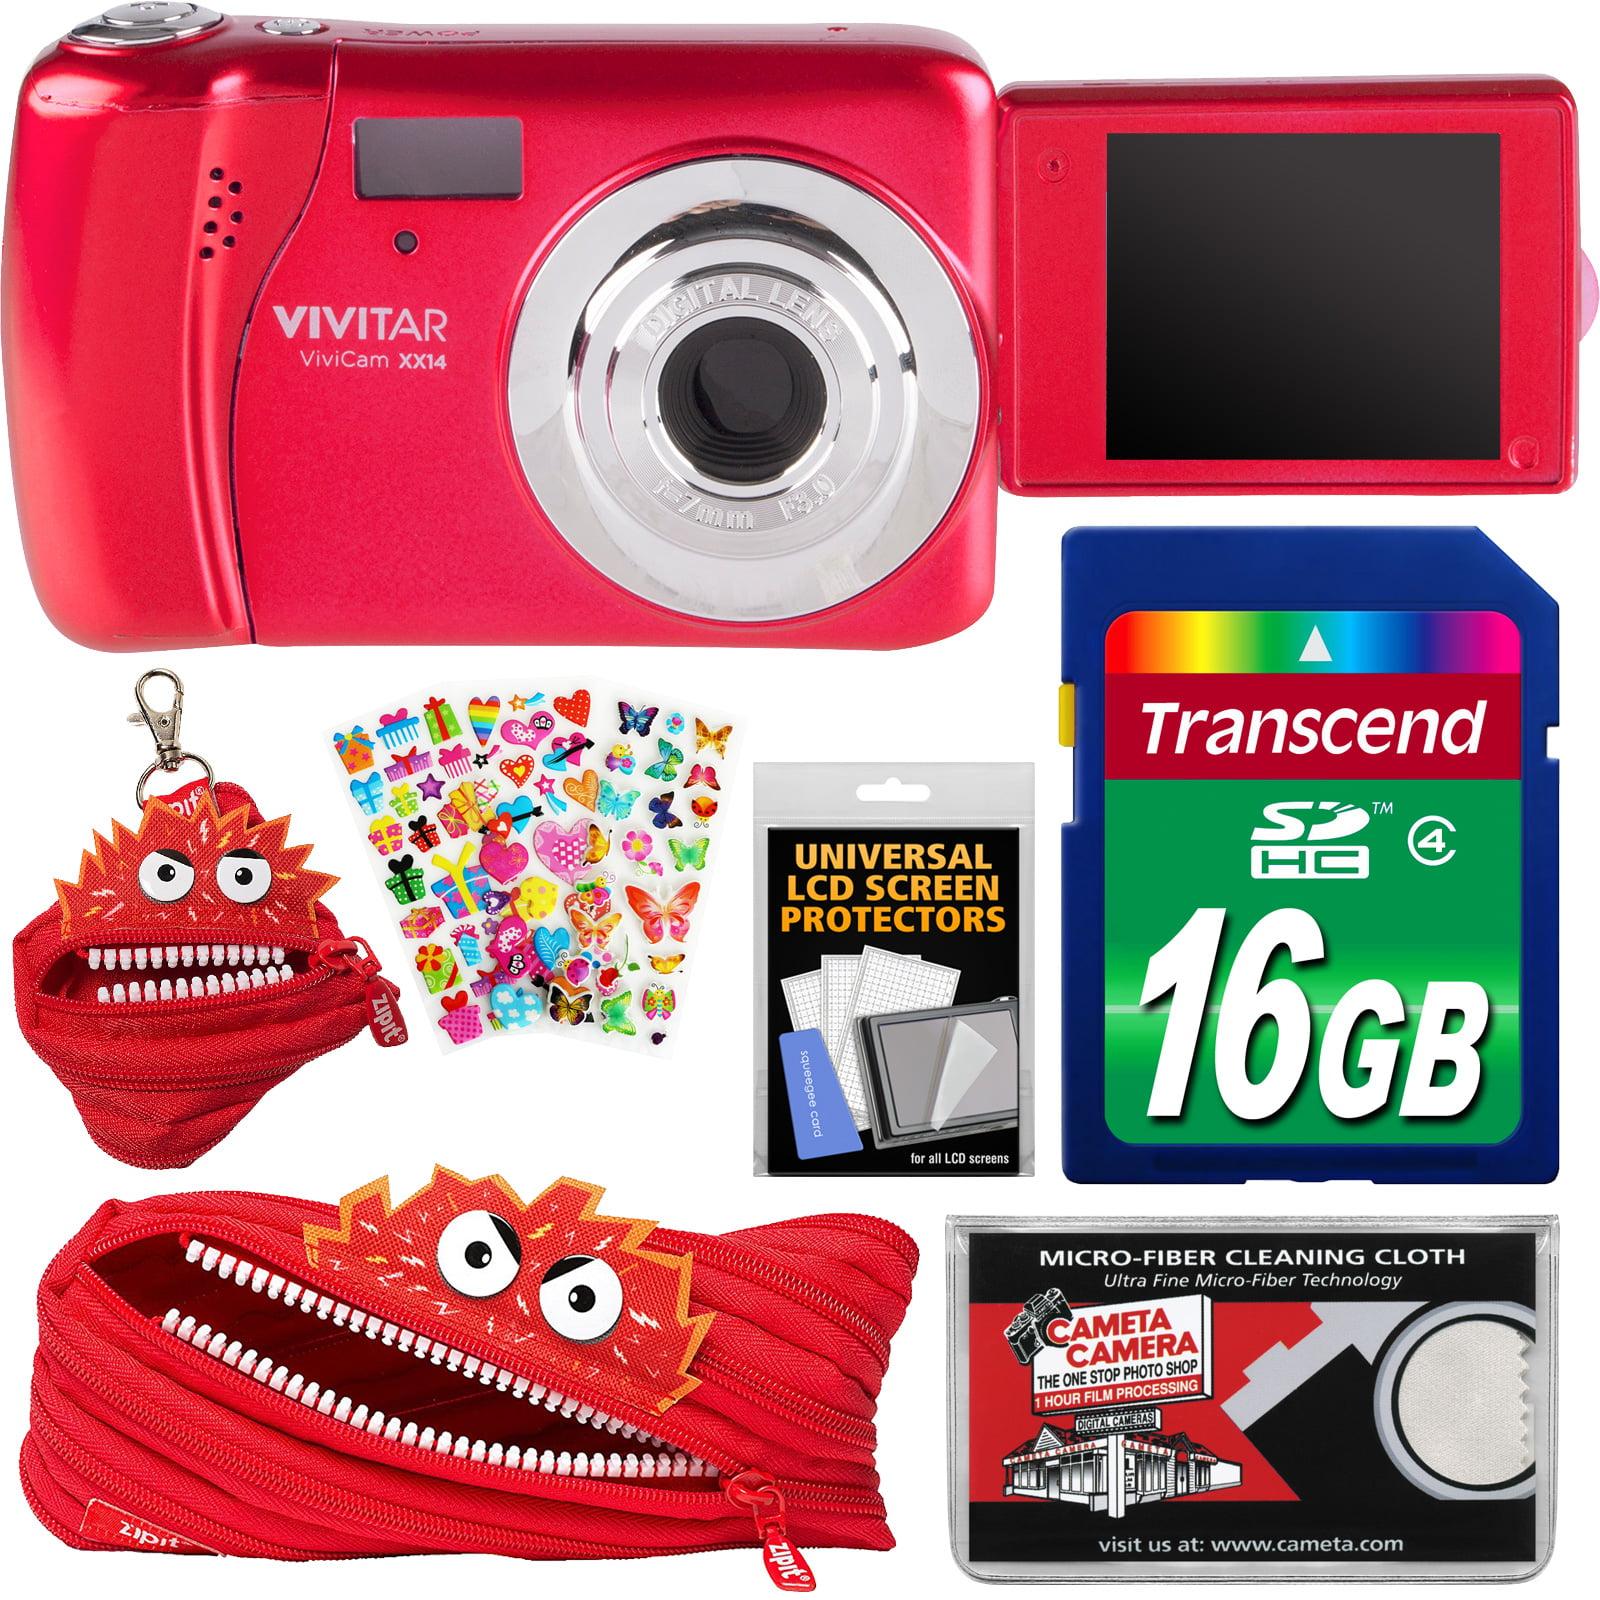 Vivitar ViviCam VXX14 Selfie Digital Camera (Red) with 16GB Card + Zipit Case & Pouch + Puffy Stickers + Cloth... by Vivitar